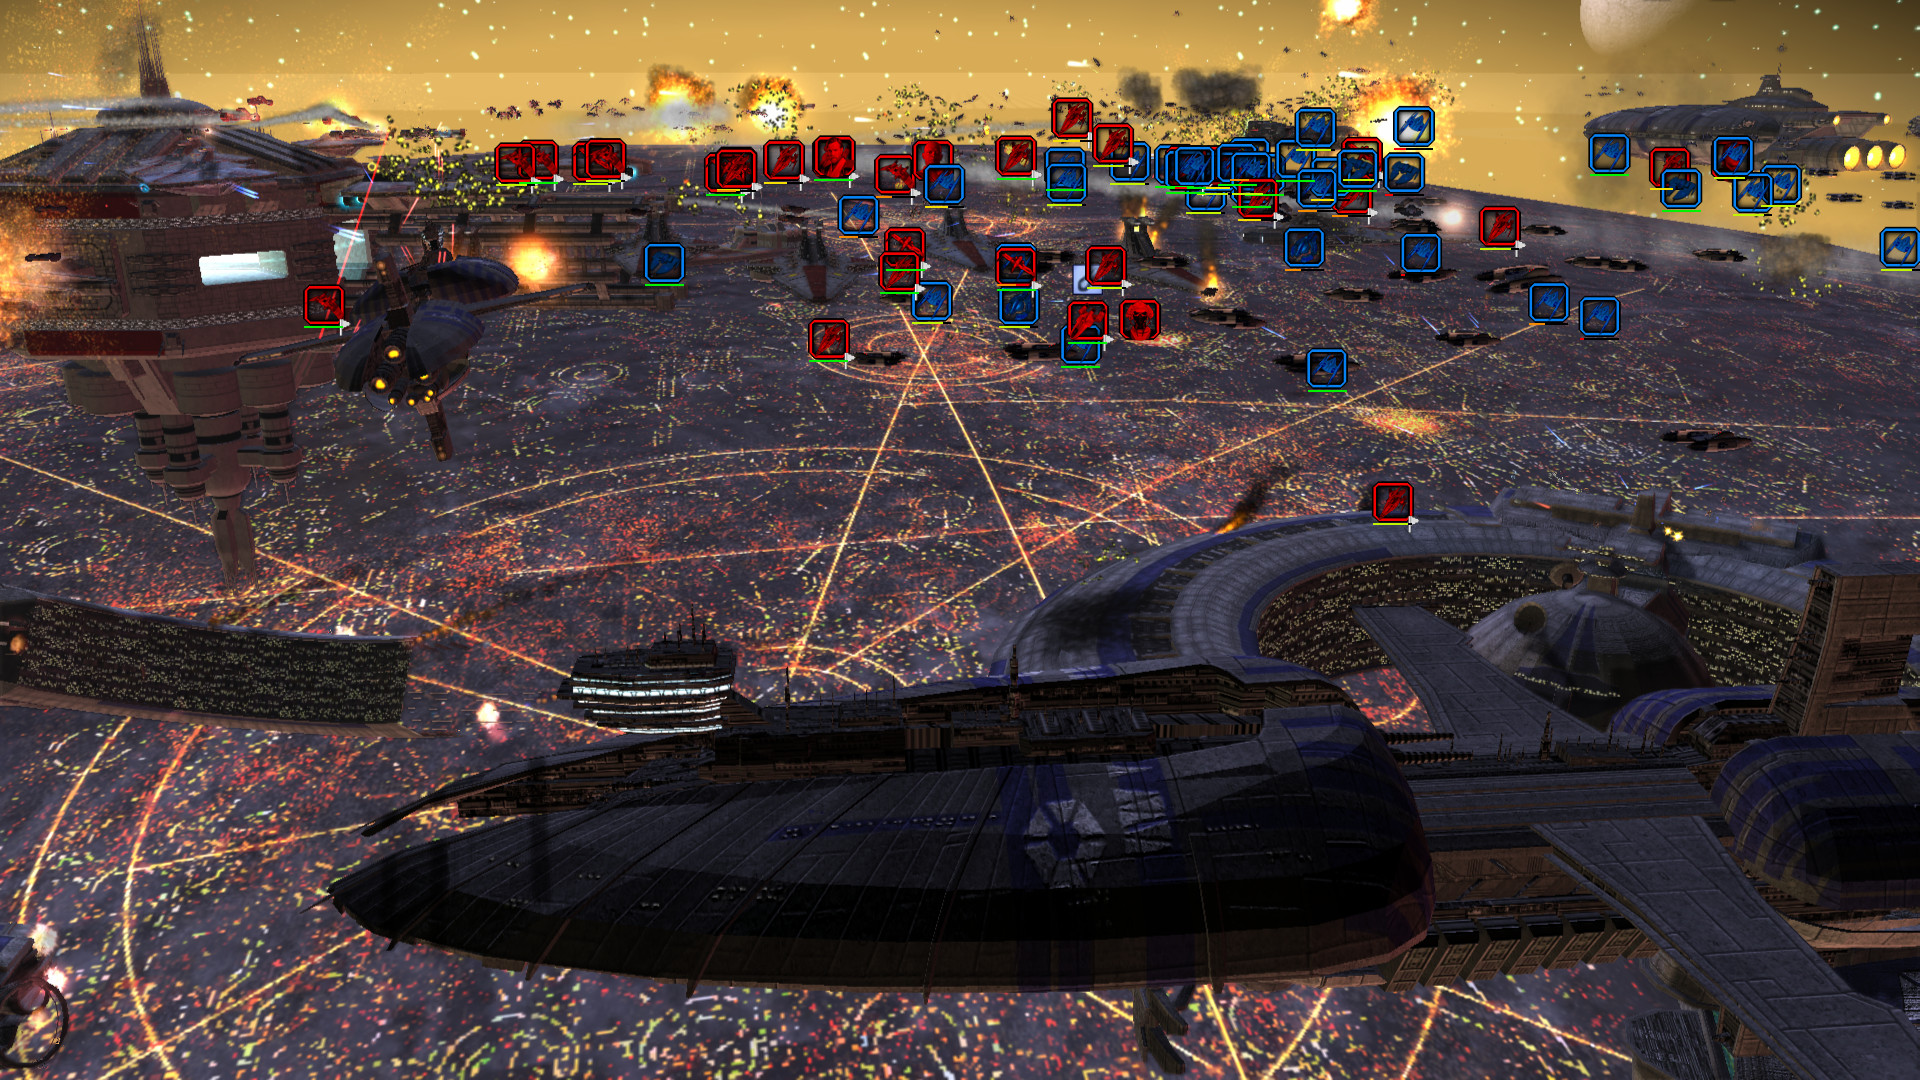 Report RSS Battle over Coruscant (view original)